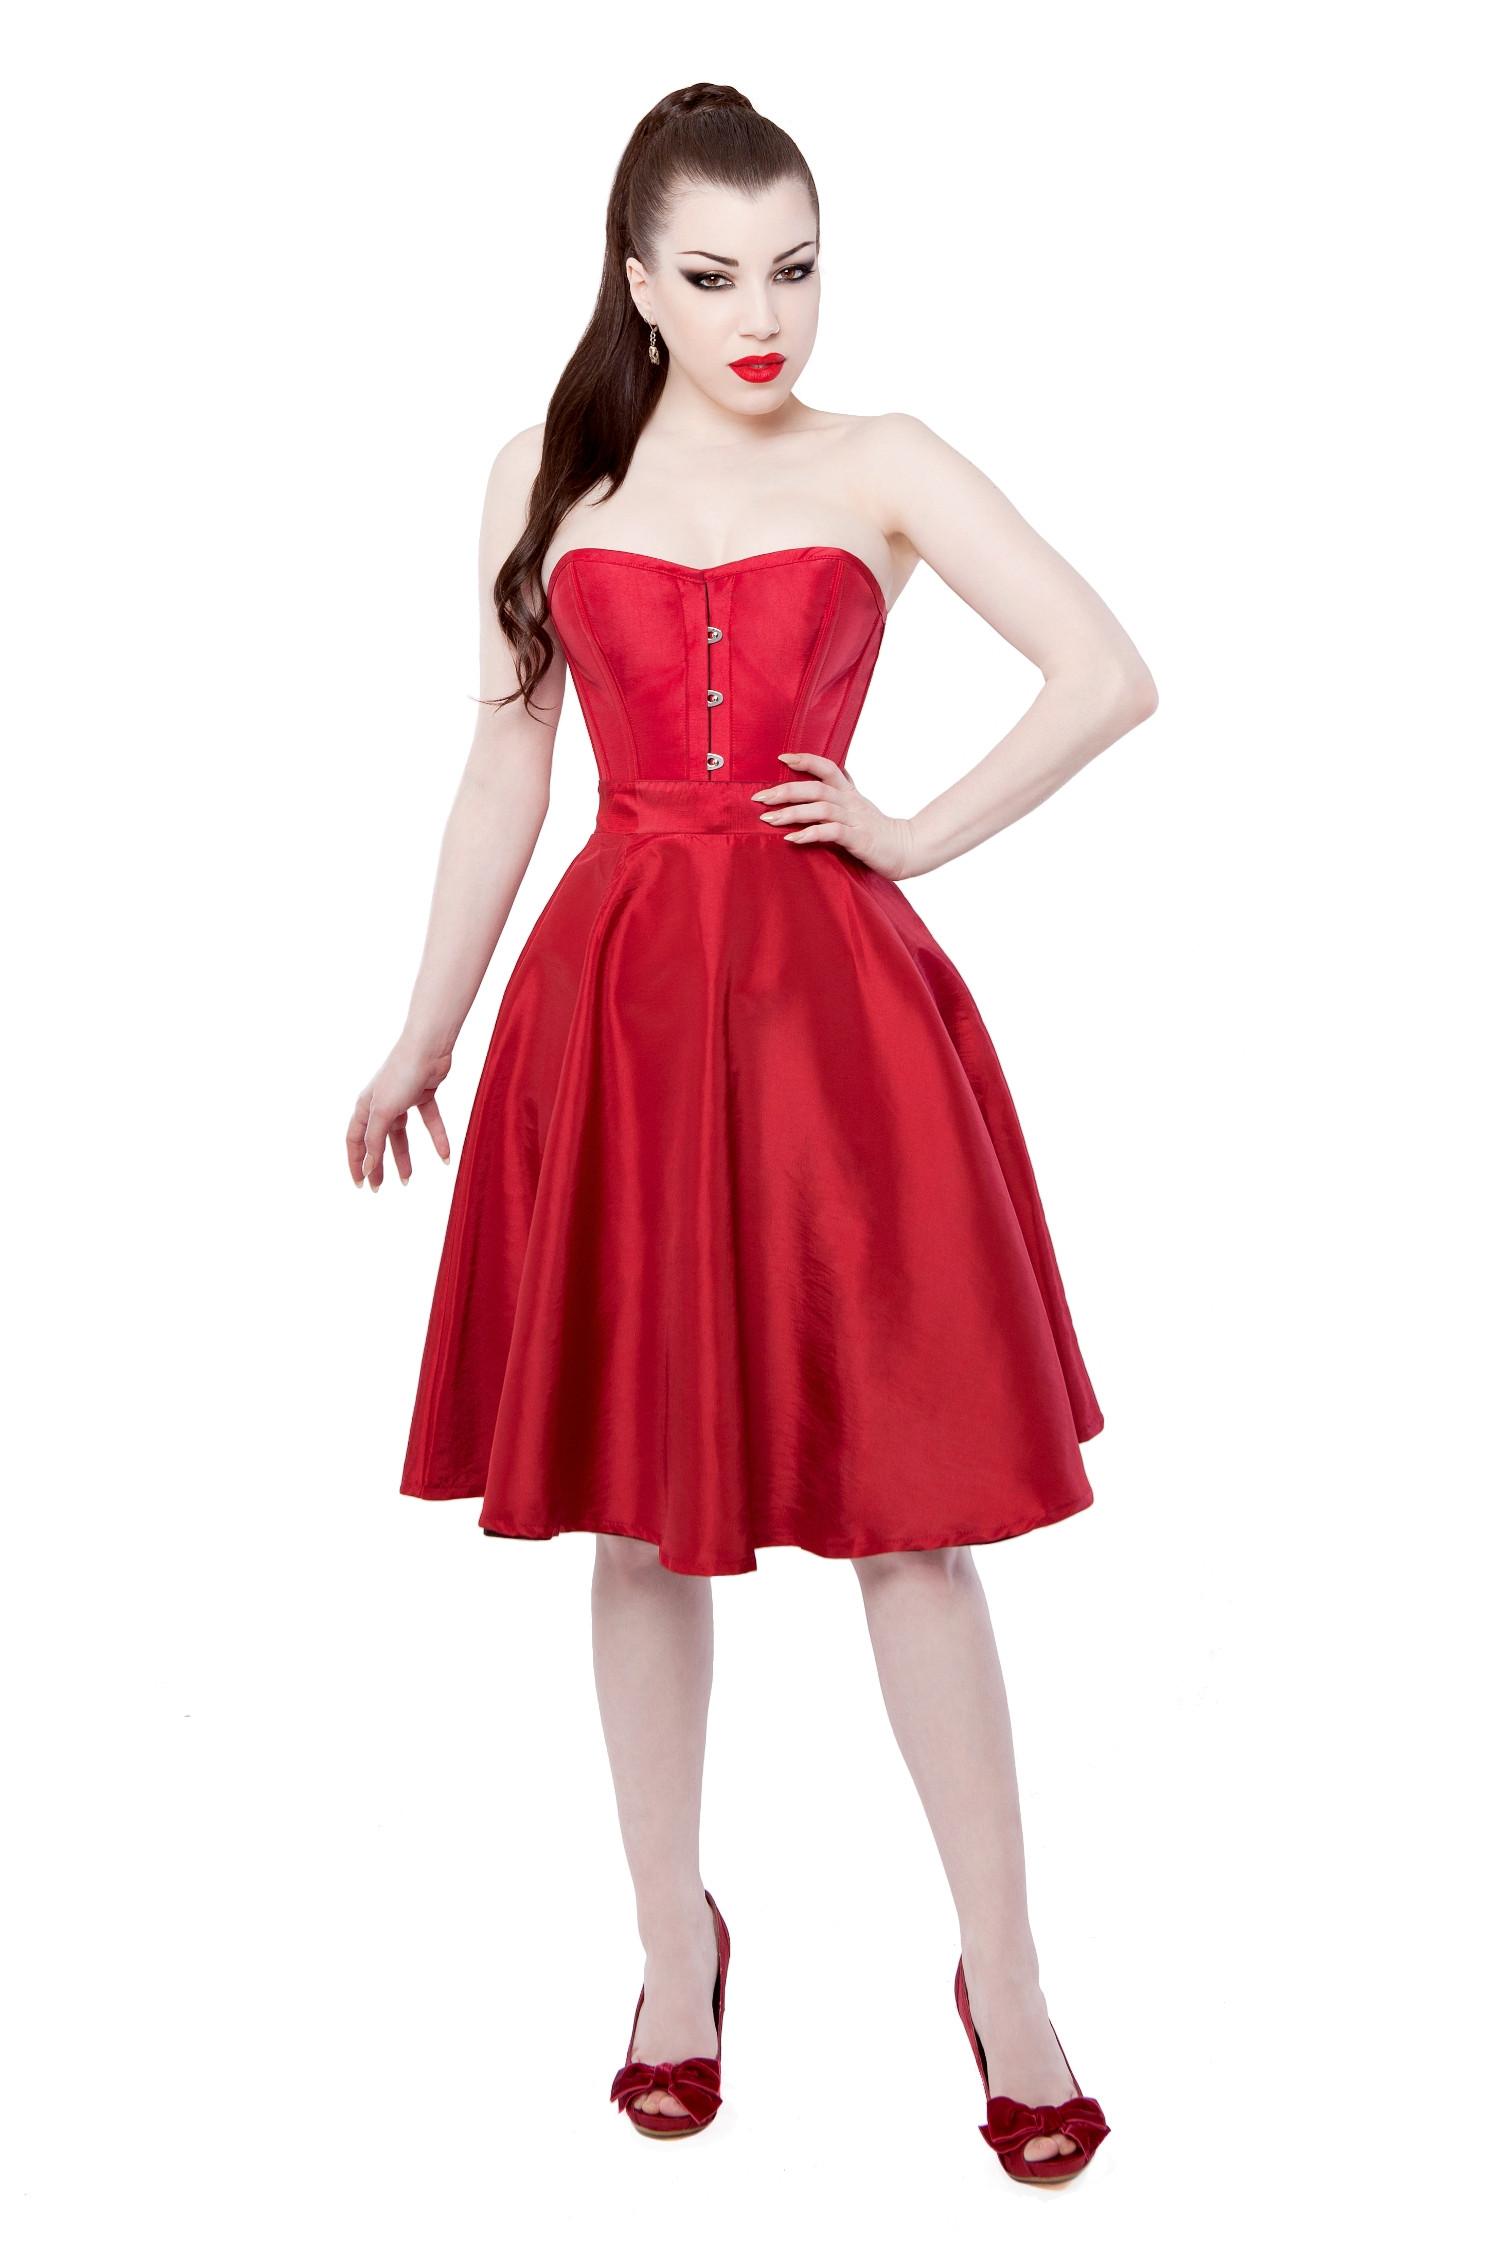 Playgirl Red Tafetta Circle Skirt